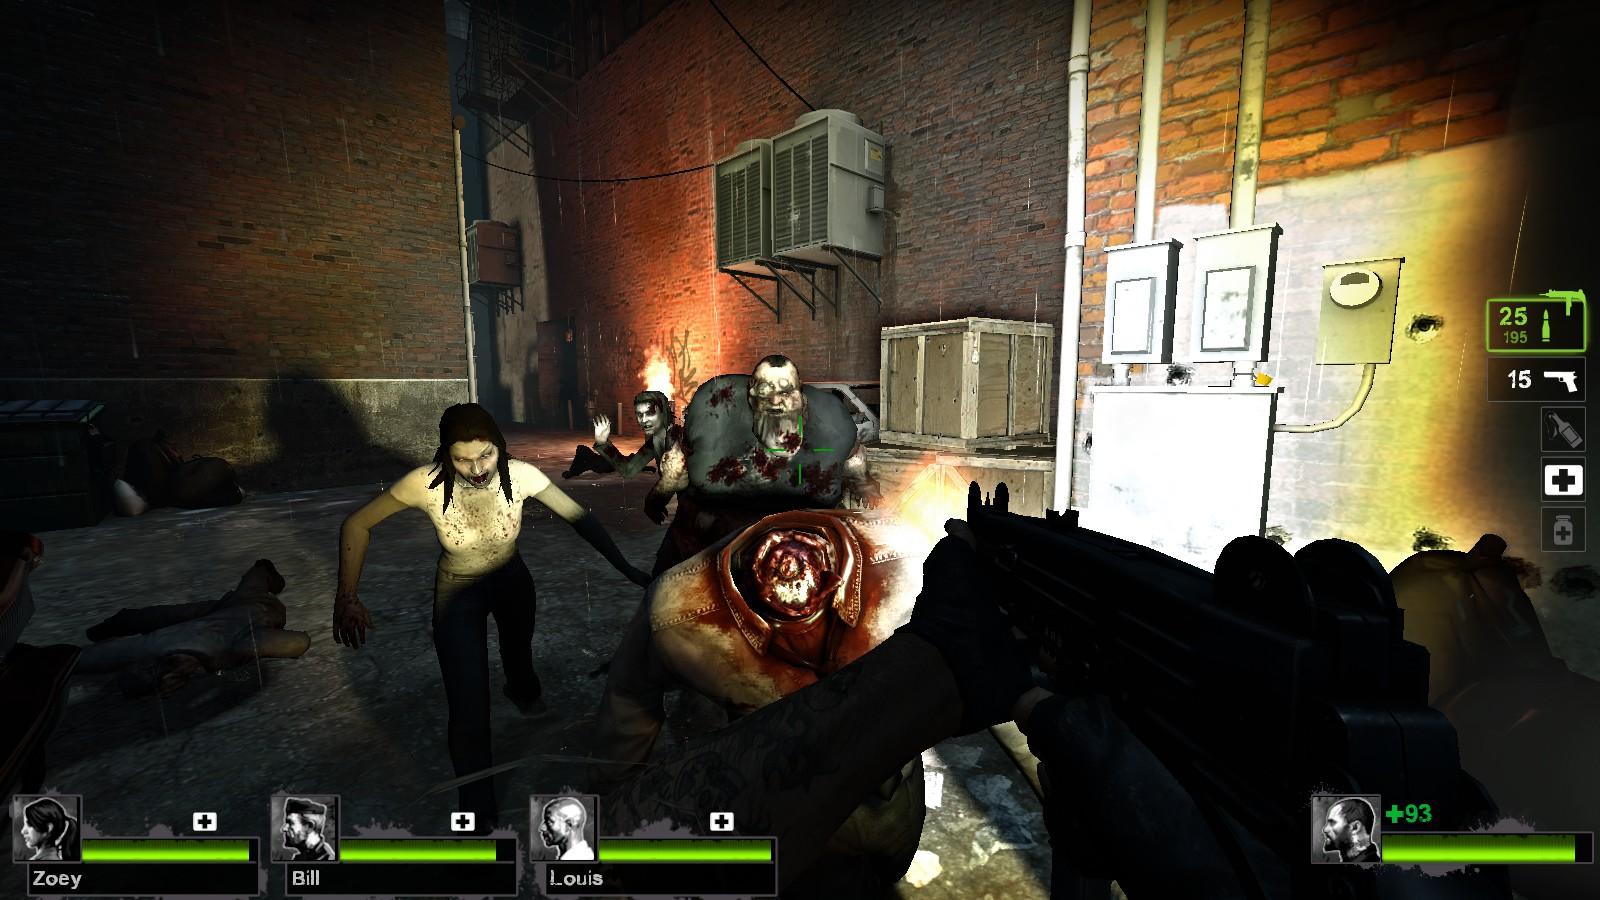 Image 25 - Left 4 Dead Beta Mutation mod for Left 4 Dead 2 - Mod DB